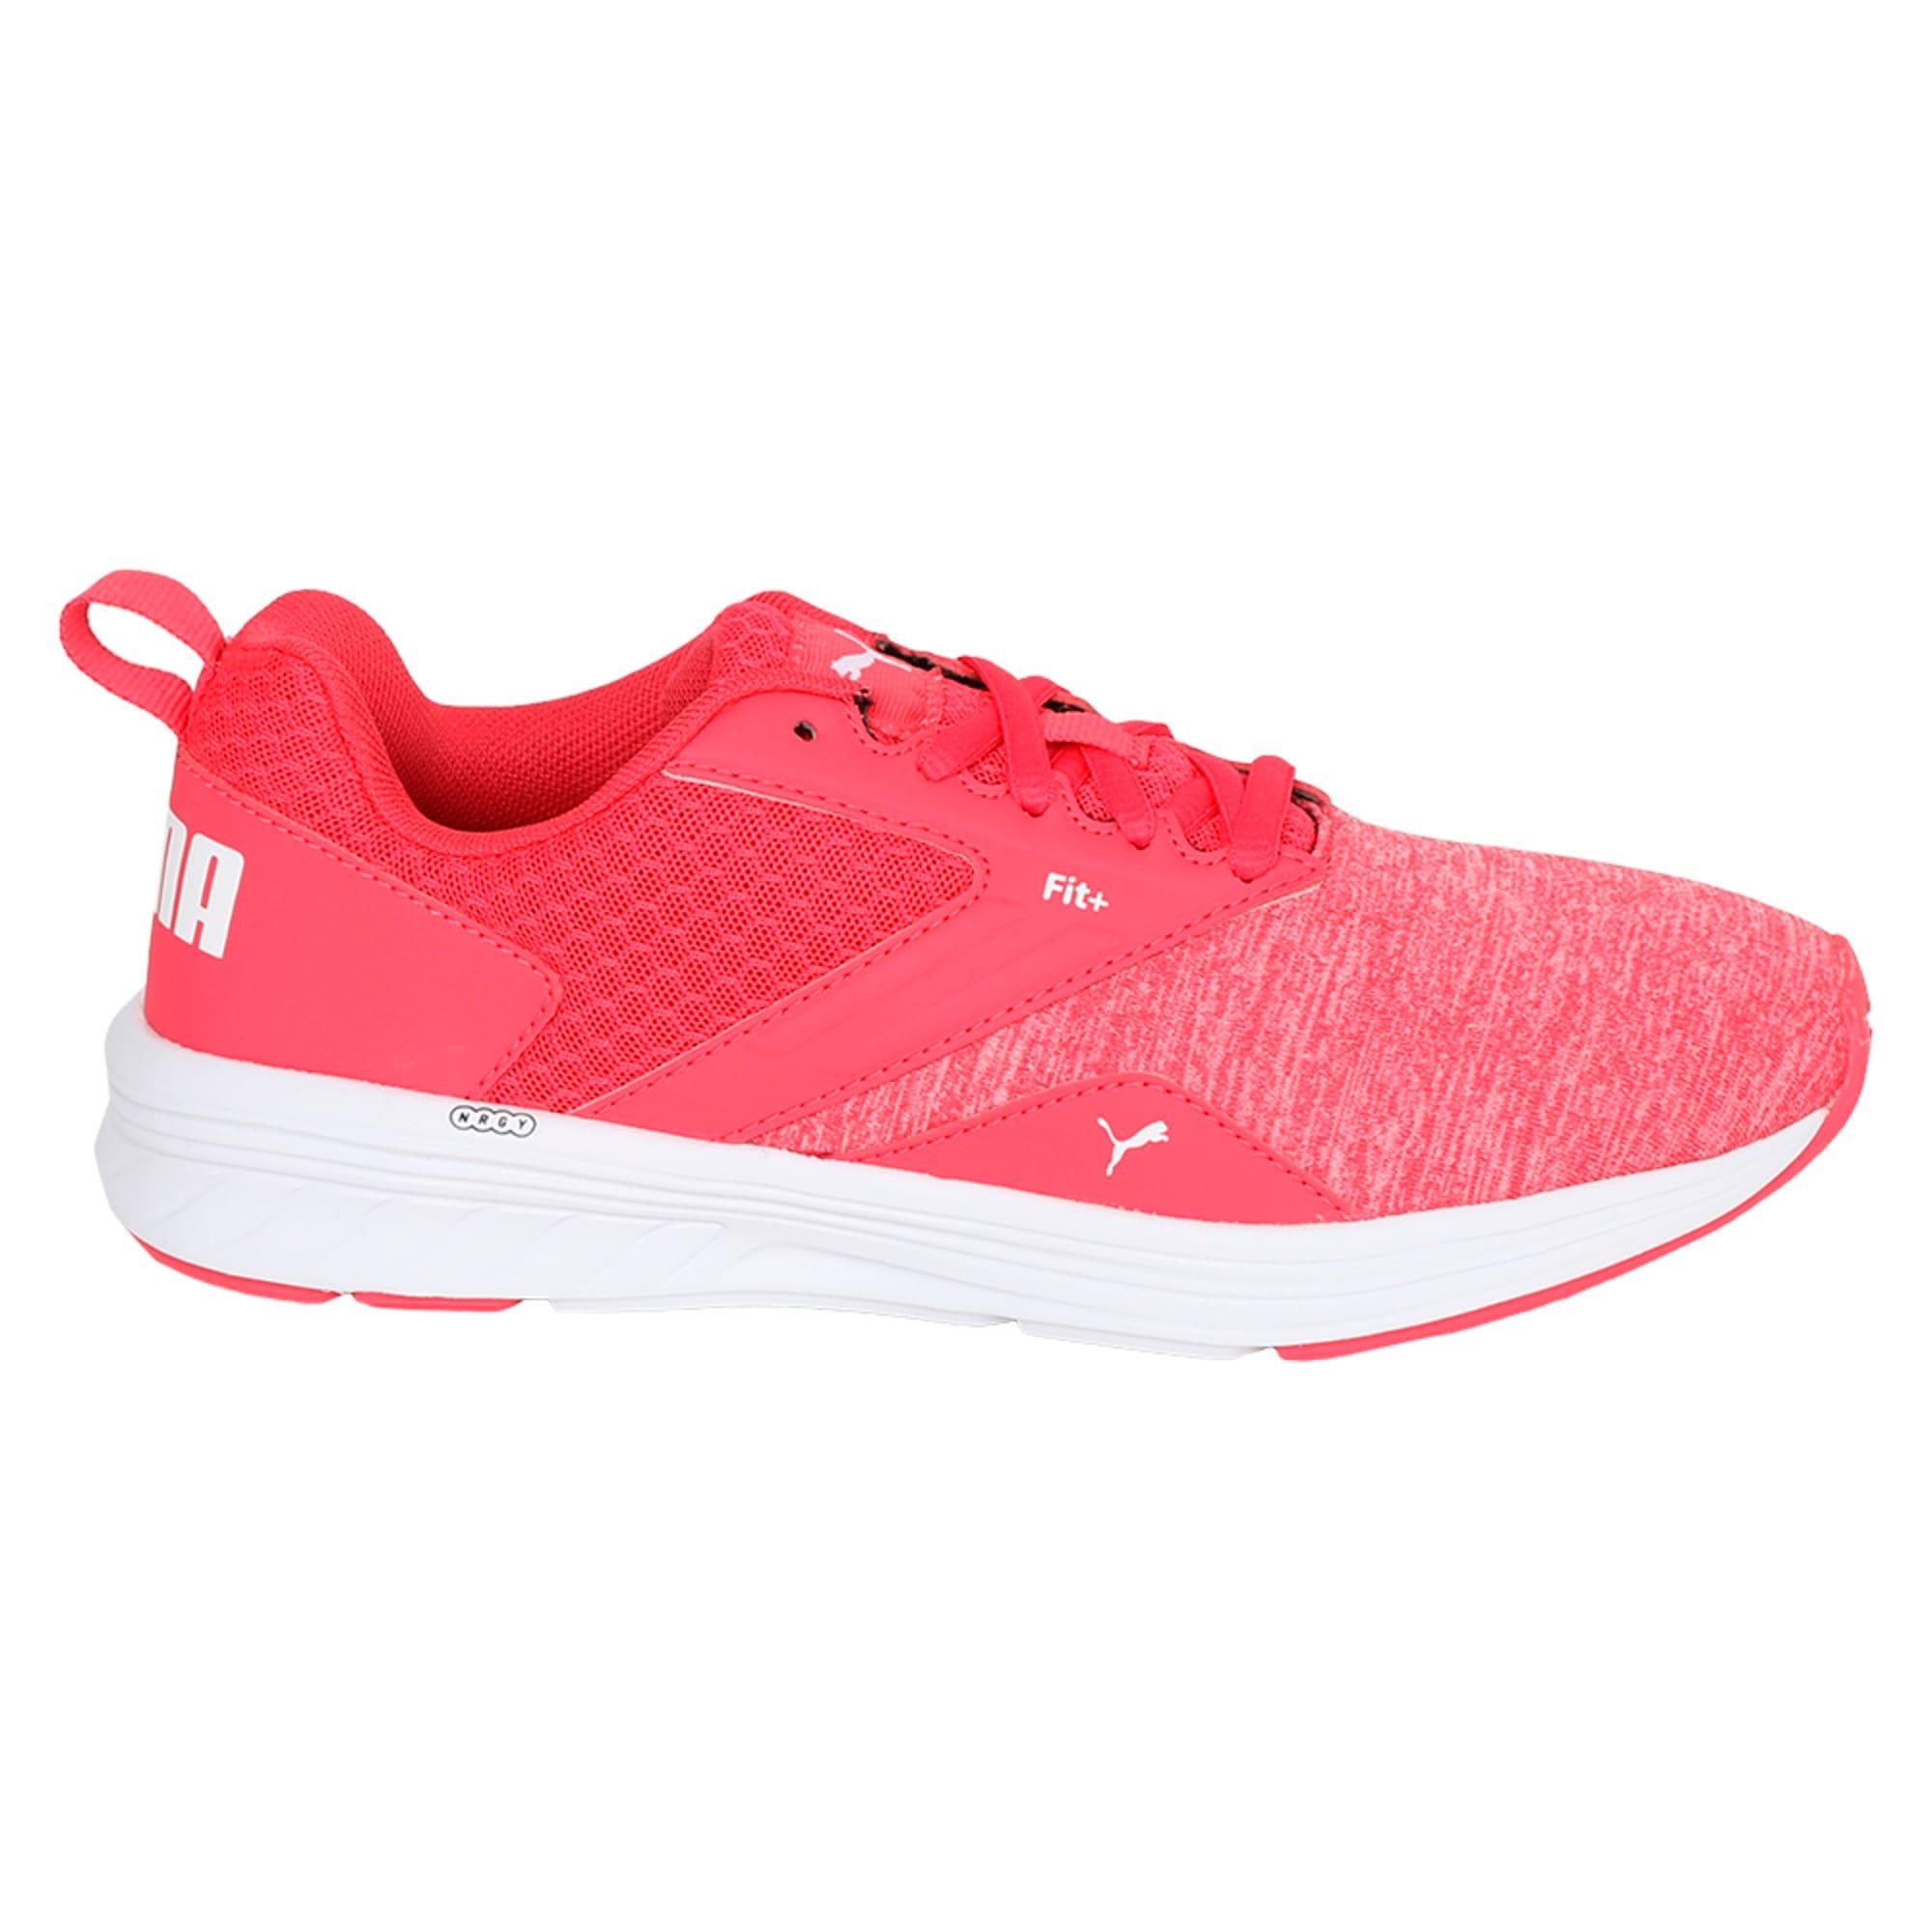 Thumbnail 5 of NRGY Comet Kids' Training Shoes, White-Paradise Pink-White, medium-IND